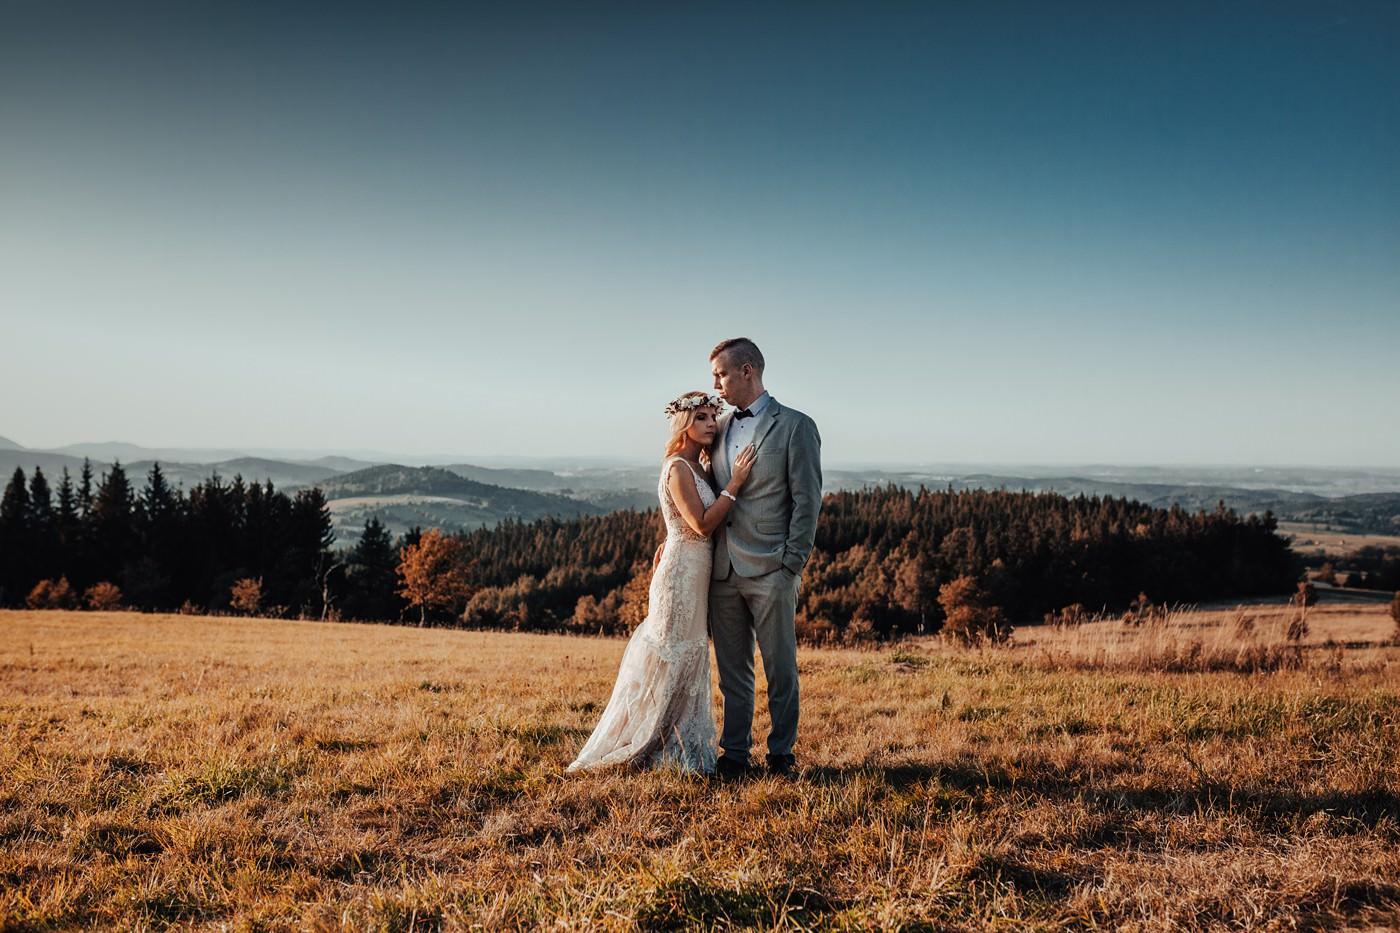 Martyna & Bartek - Wesele w Górach Sowich 104